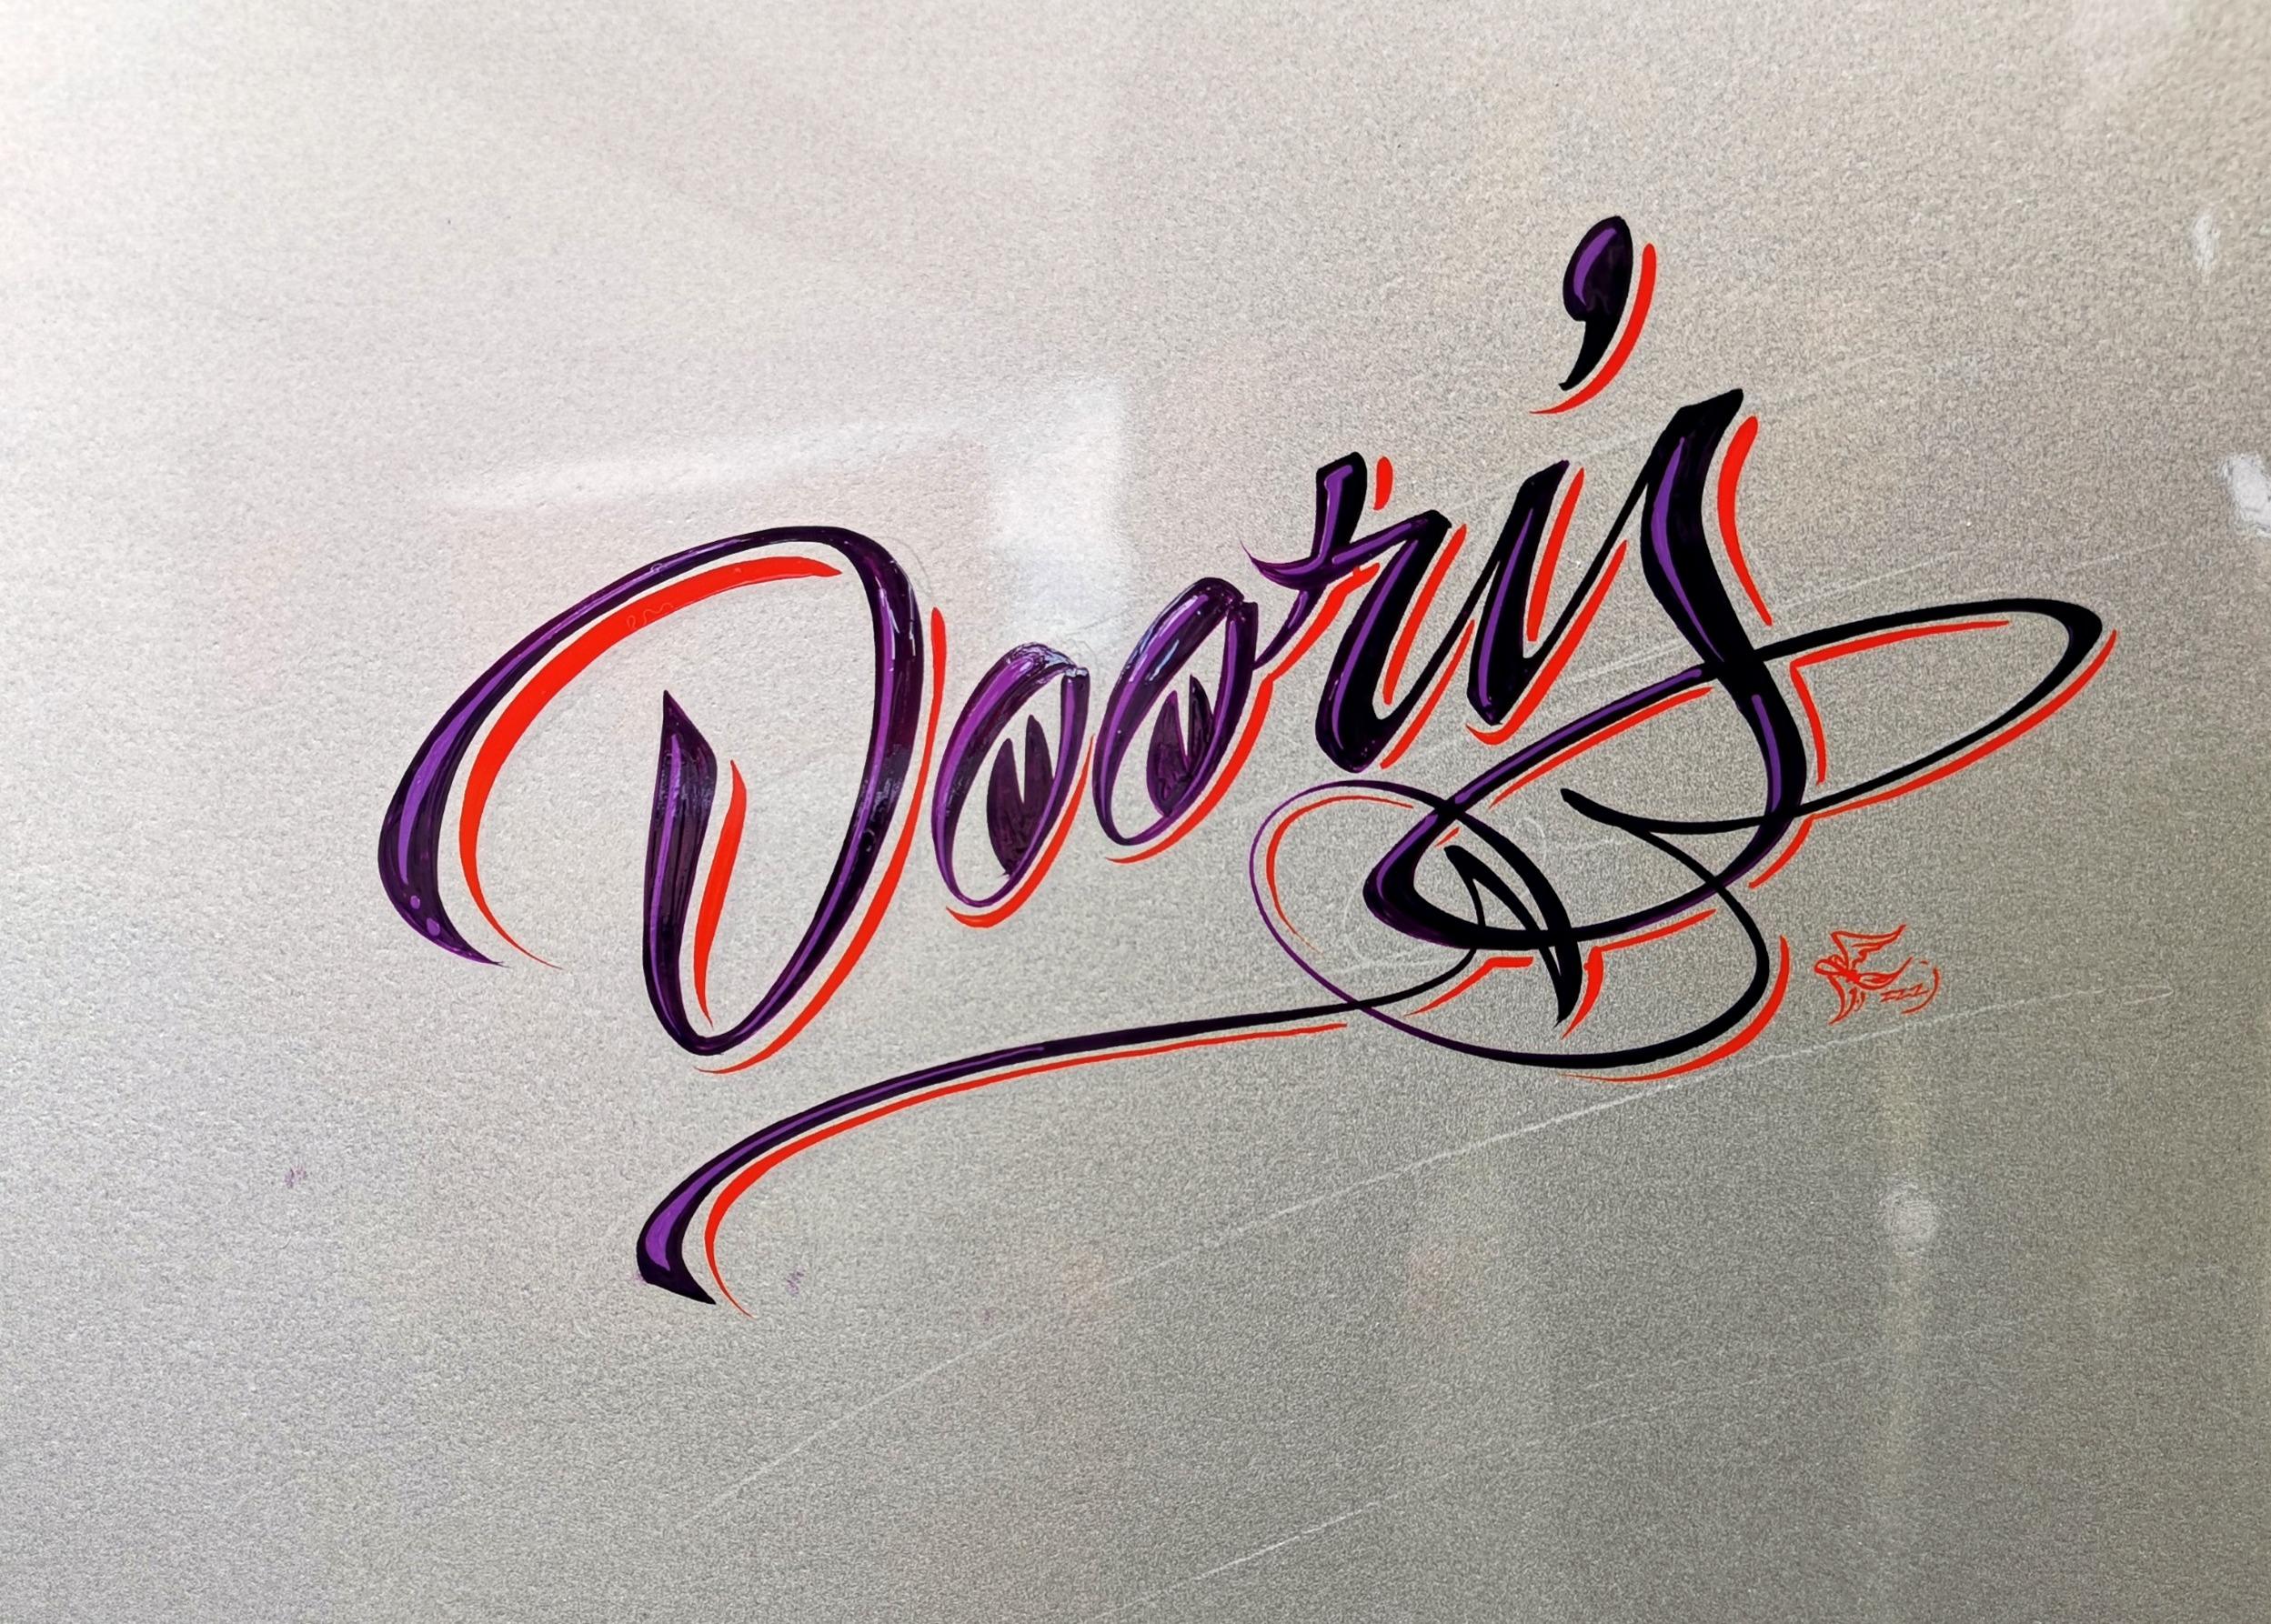 Dooris